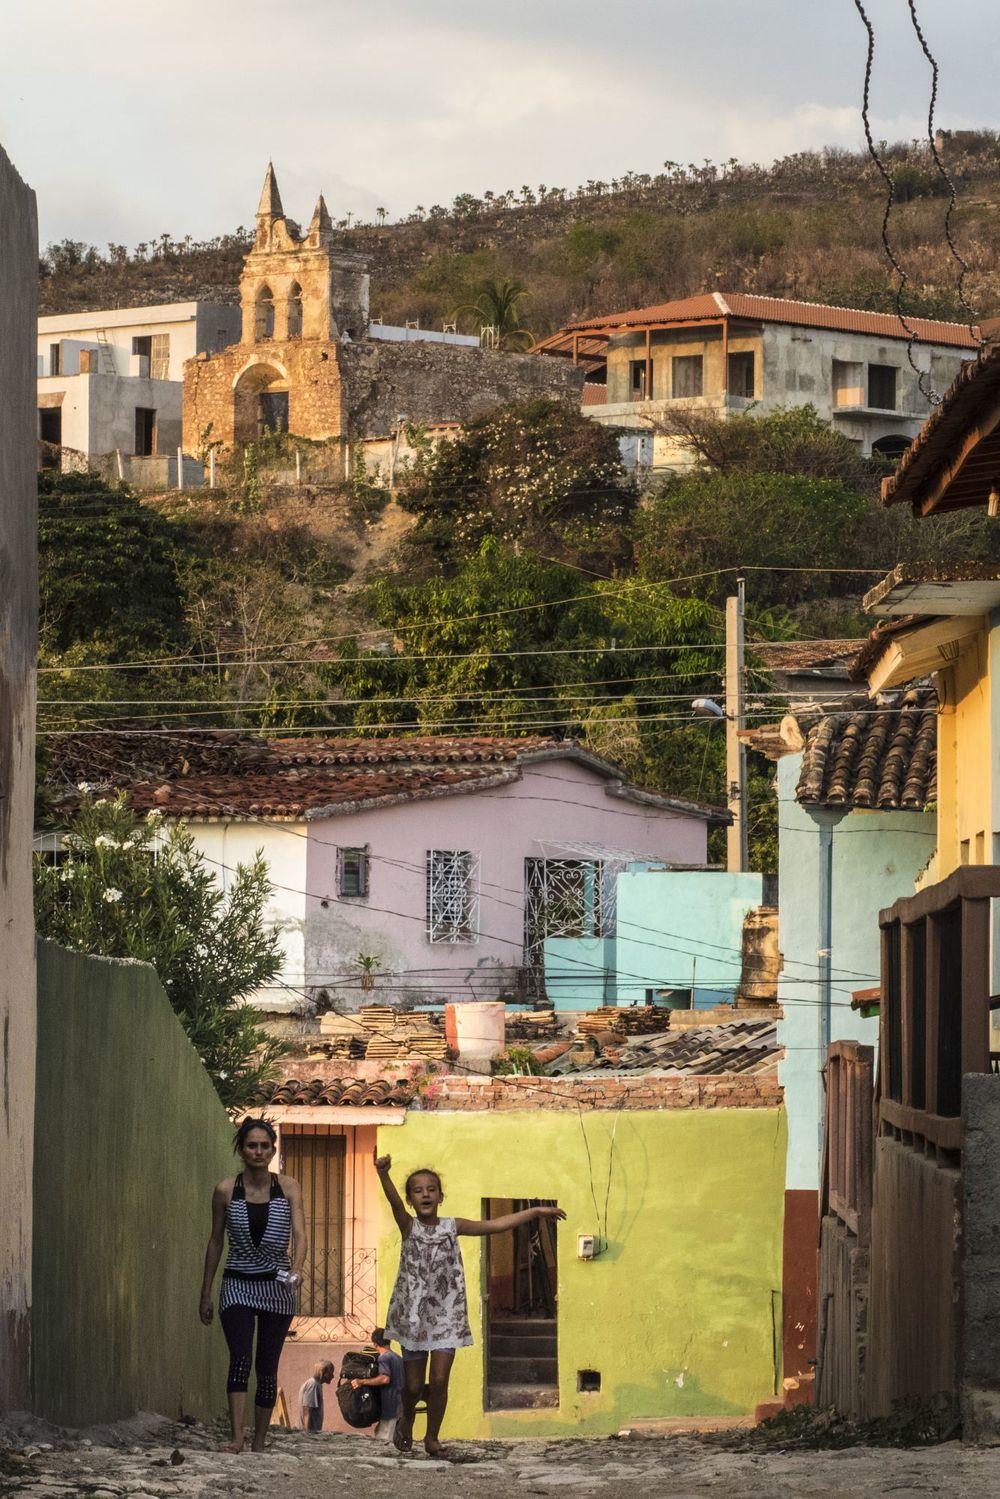 street-travel-photography-cuba-benabib.JPG